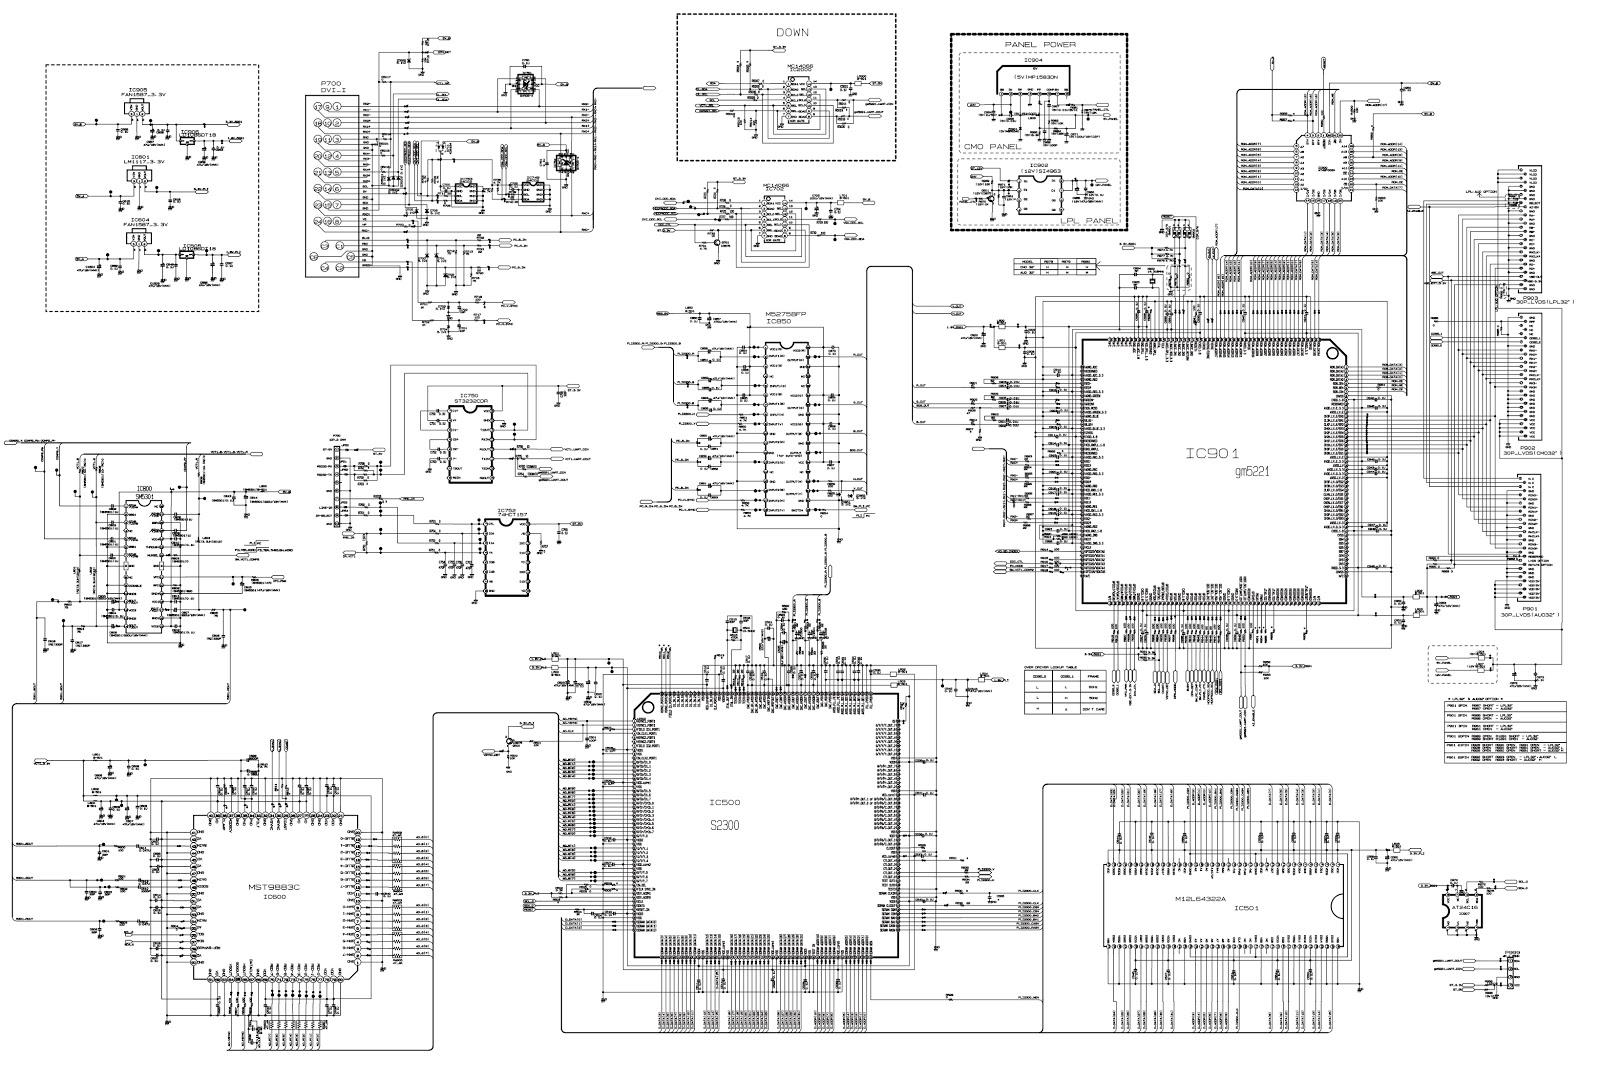 hight resolution of lg rz23lz55 lcd tv schematic circuit diagram schematic diagrams rh schematicscom blogspot com